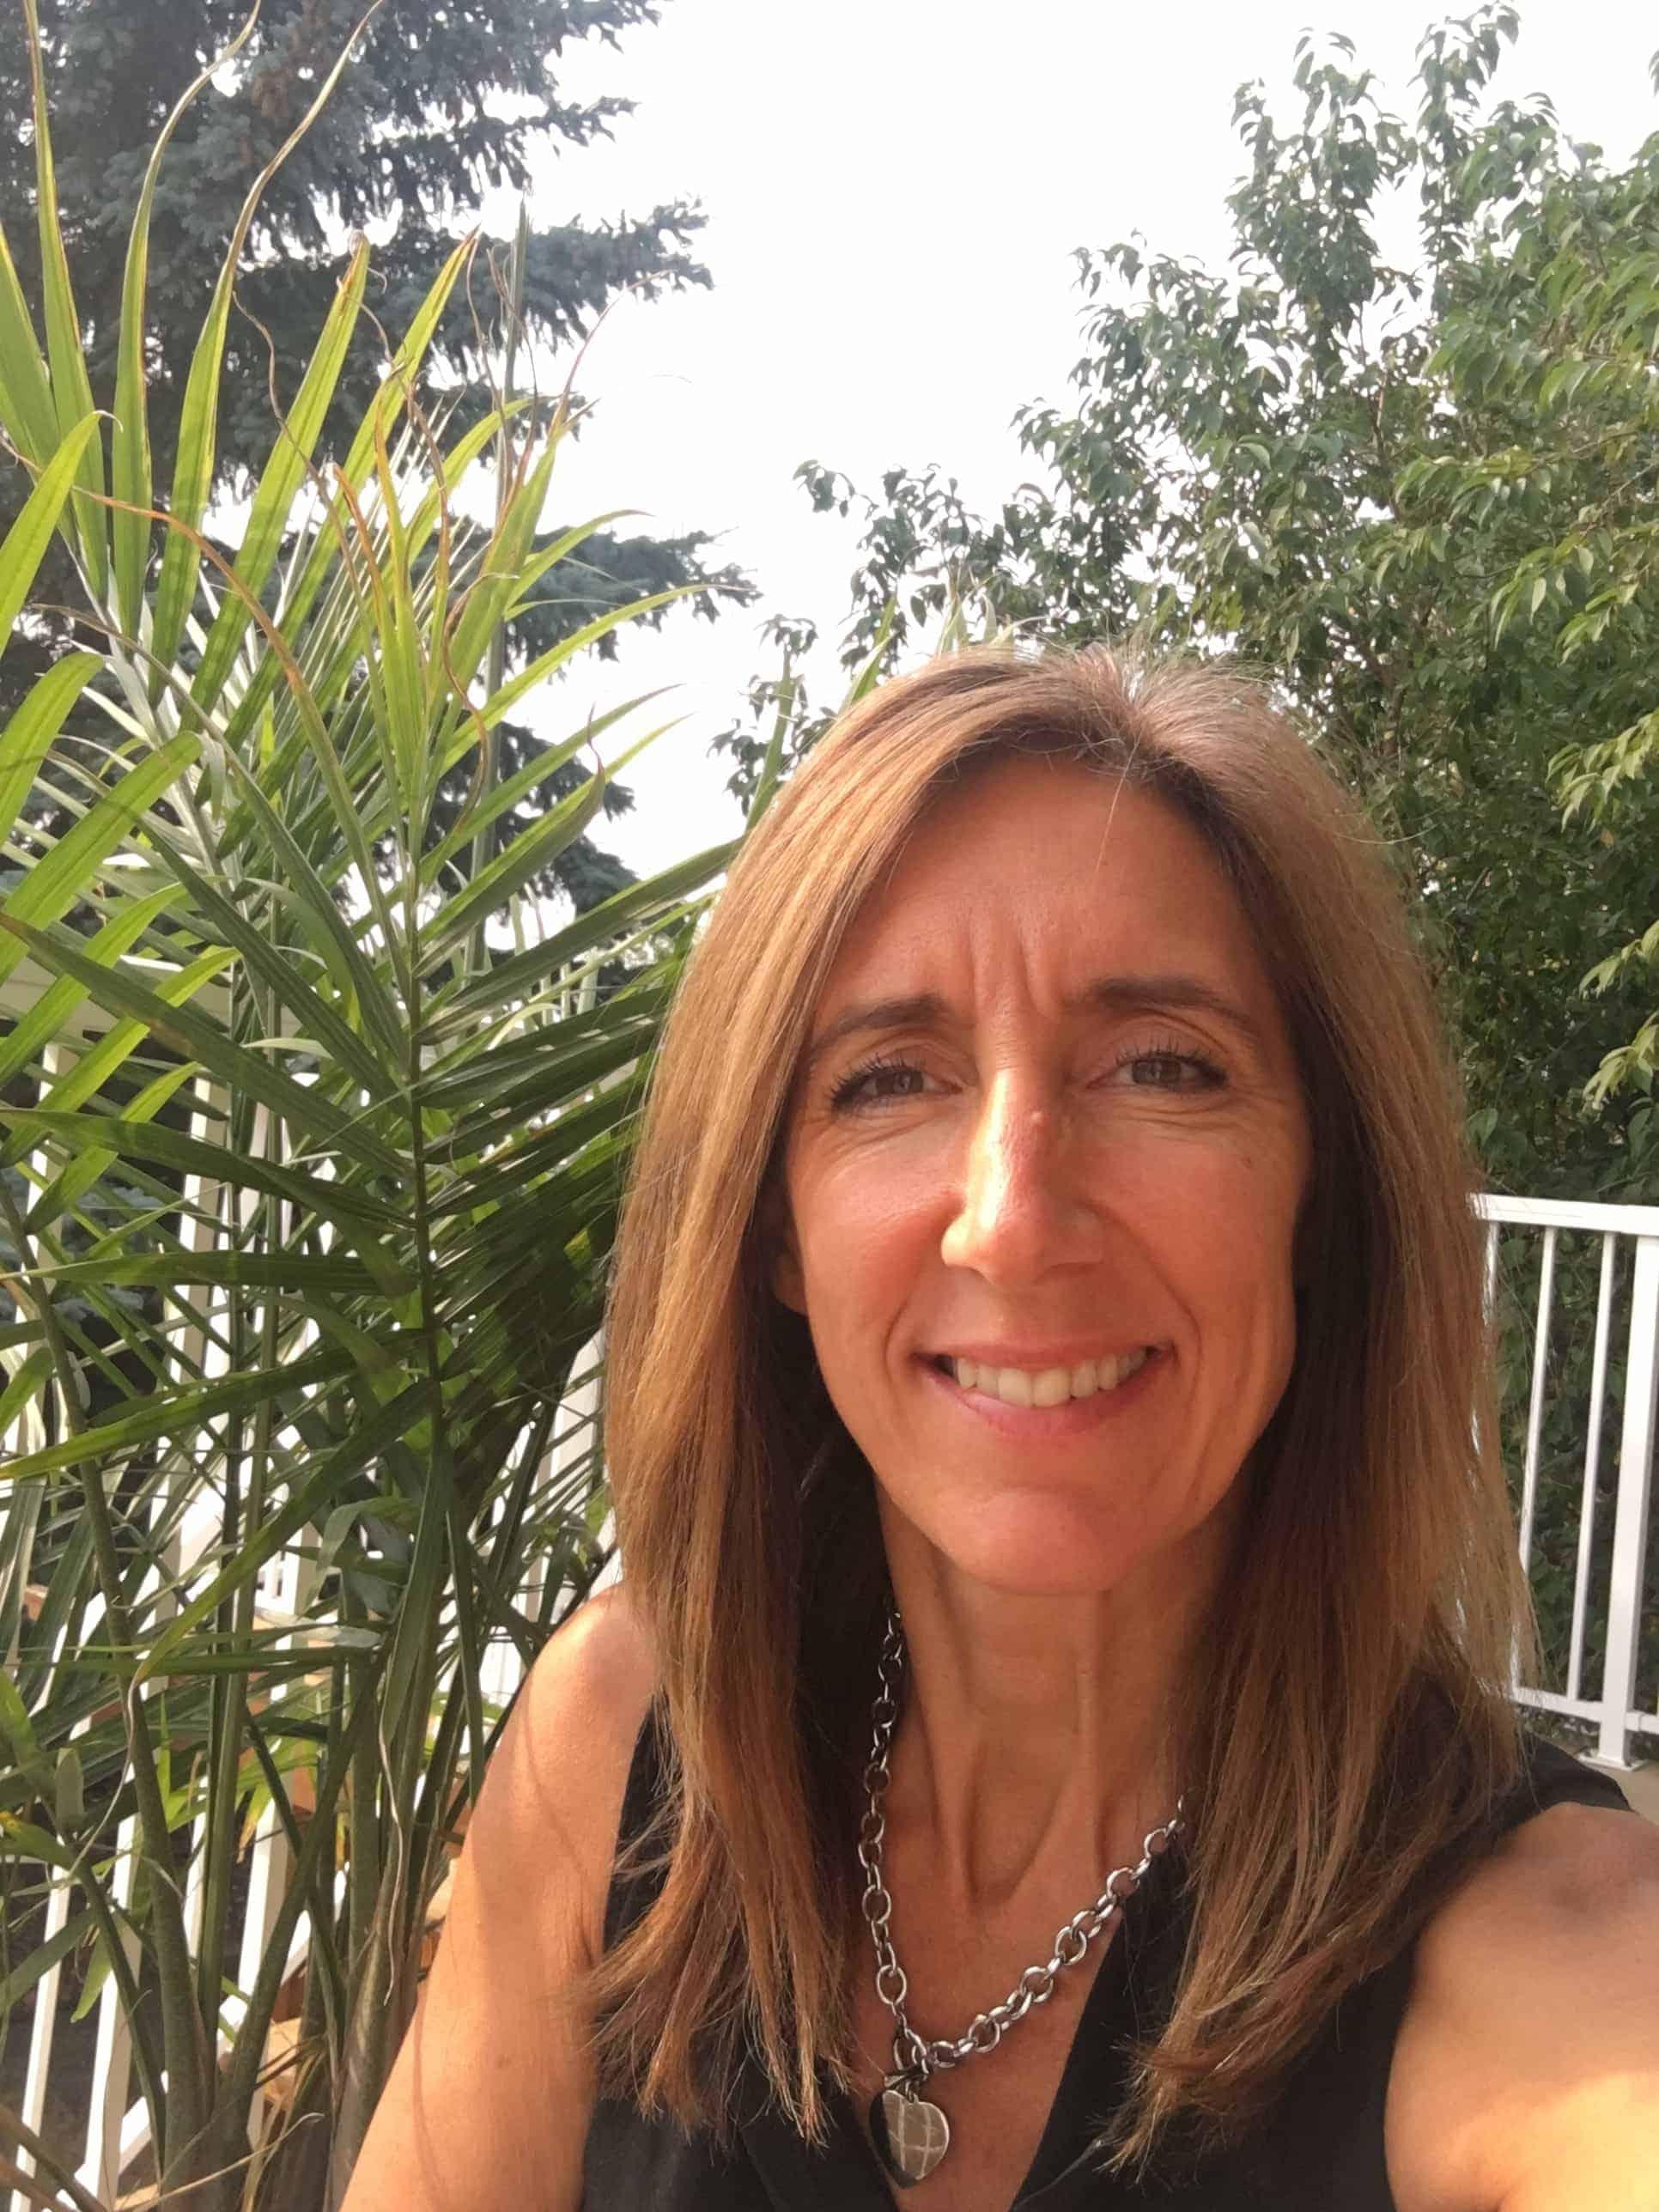 Karen Quinlan Testimonial for Fresh Start Cancer Survivor's Blueprint to a Healthier Home